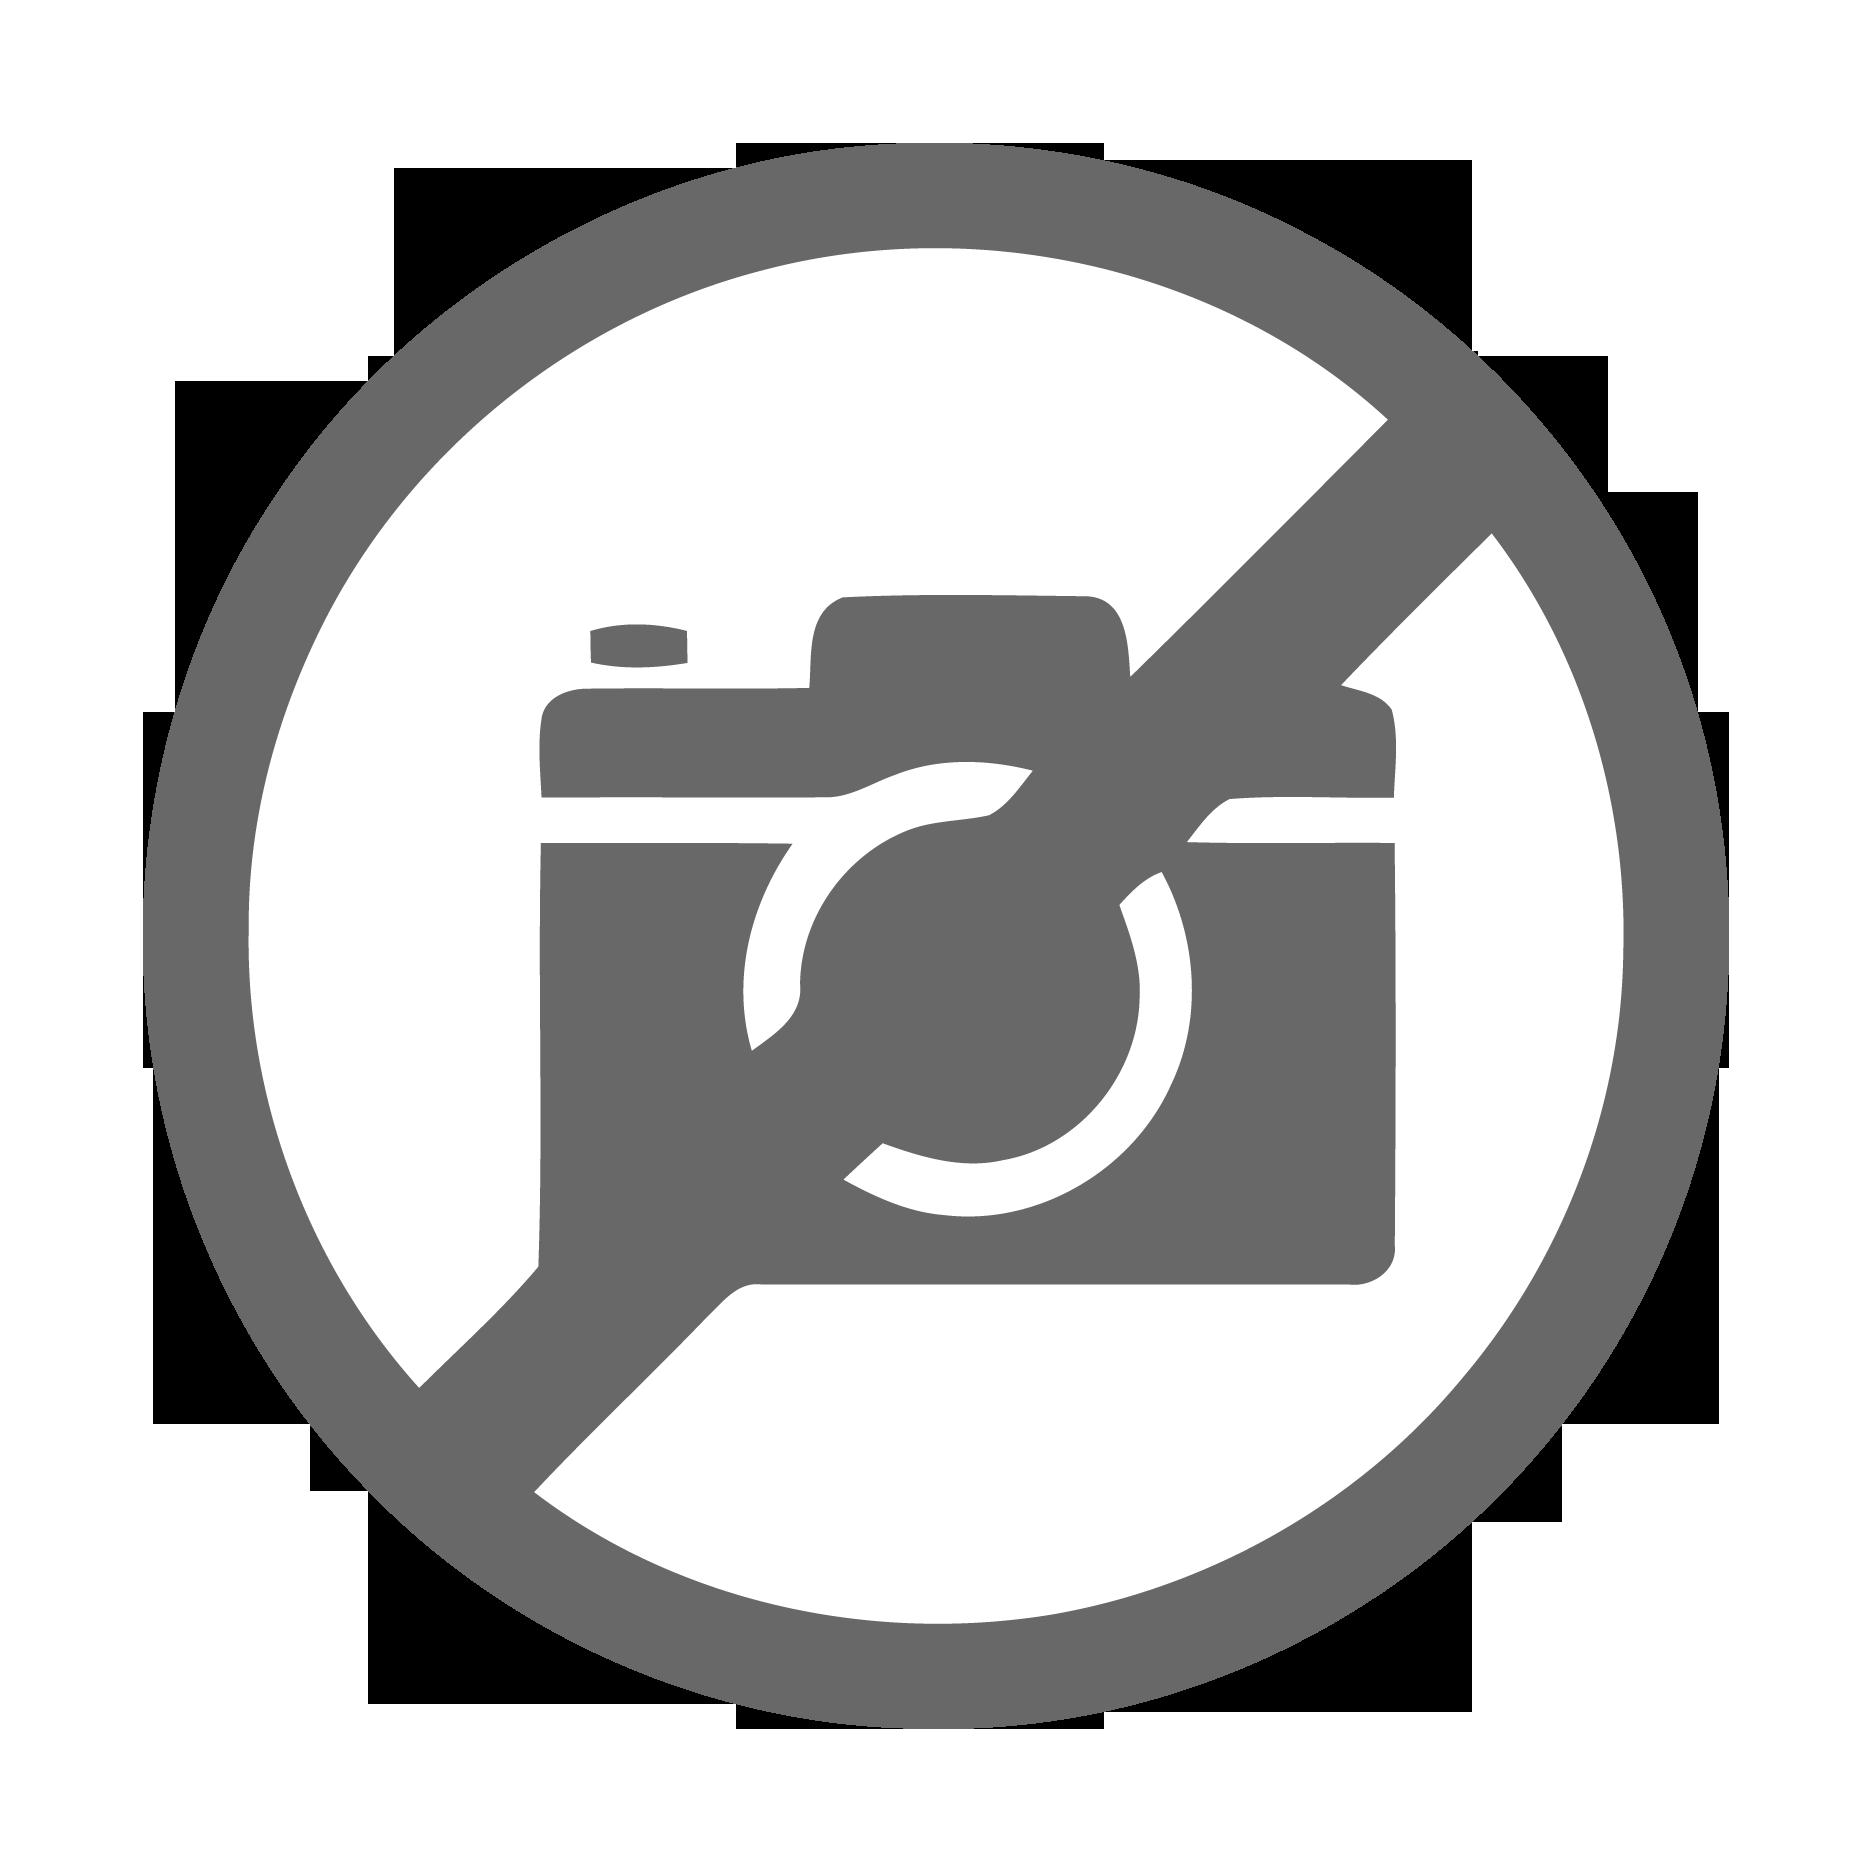 Chasovnika